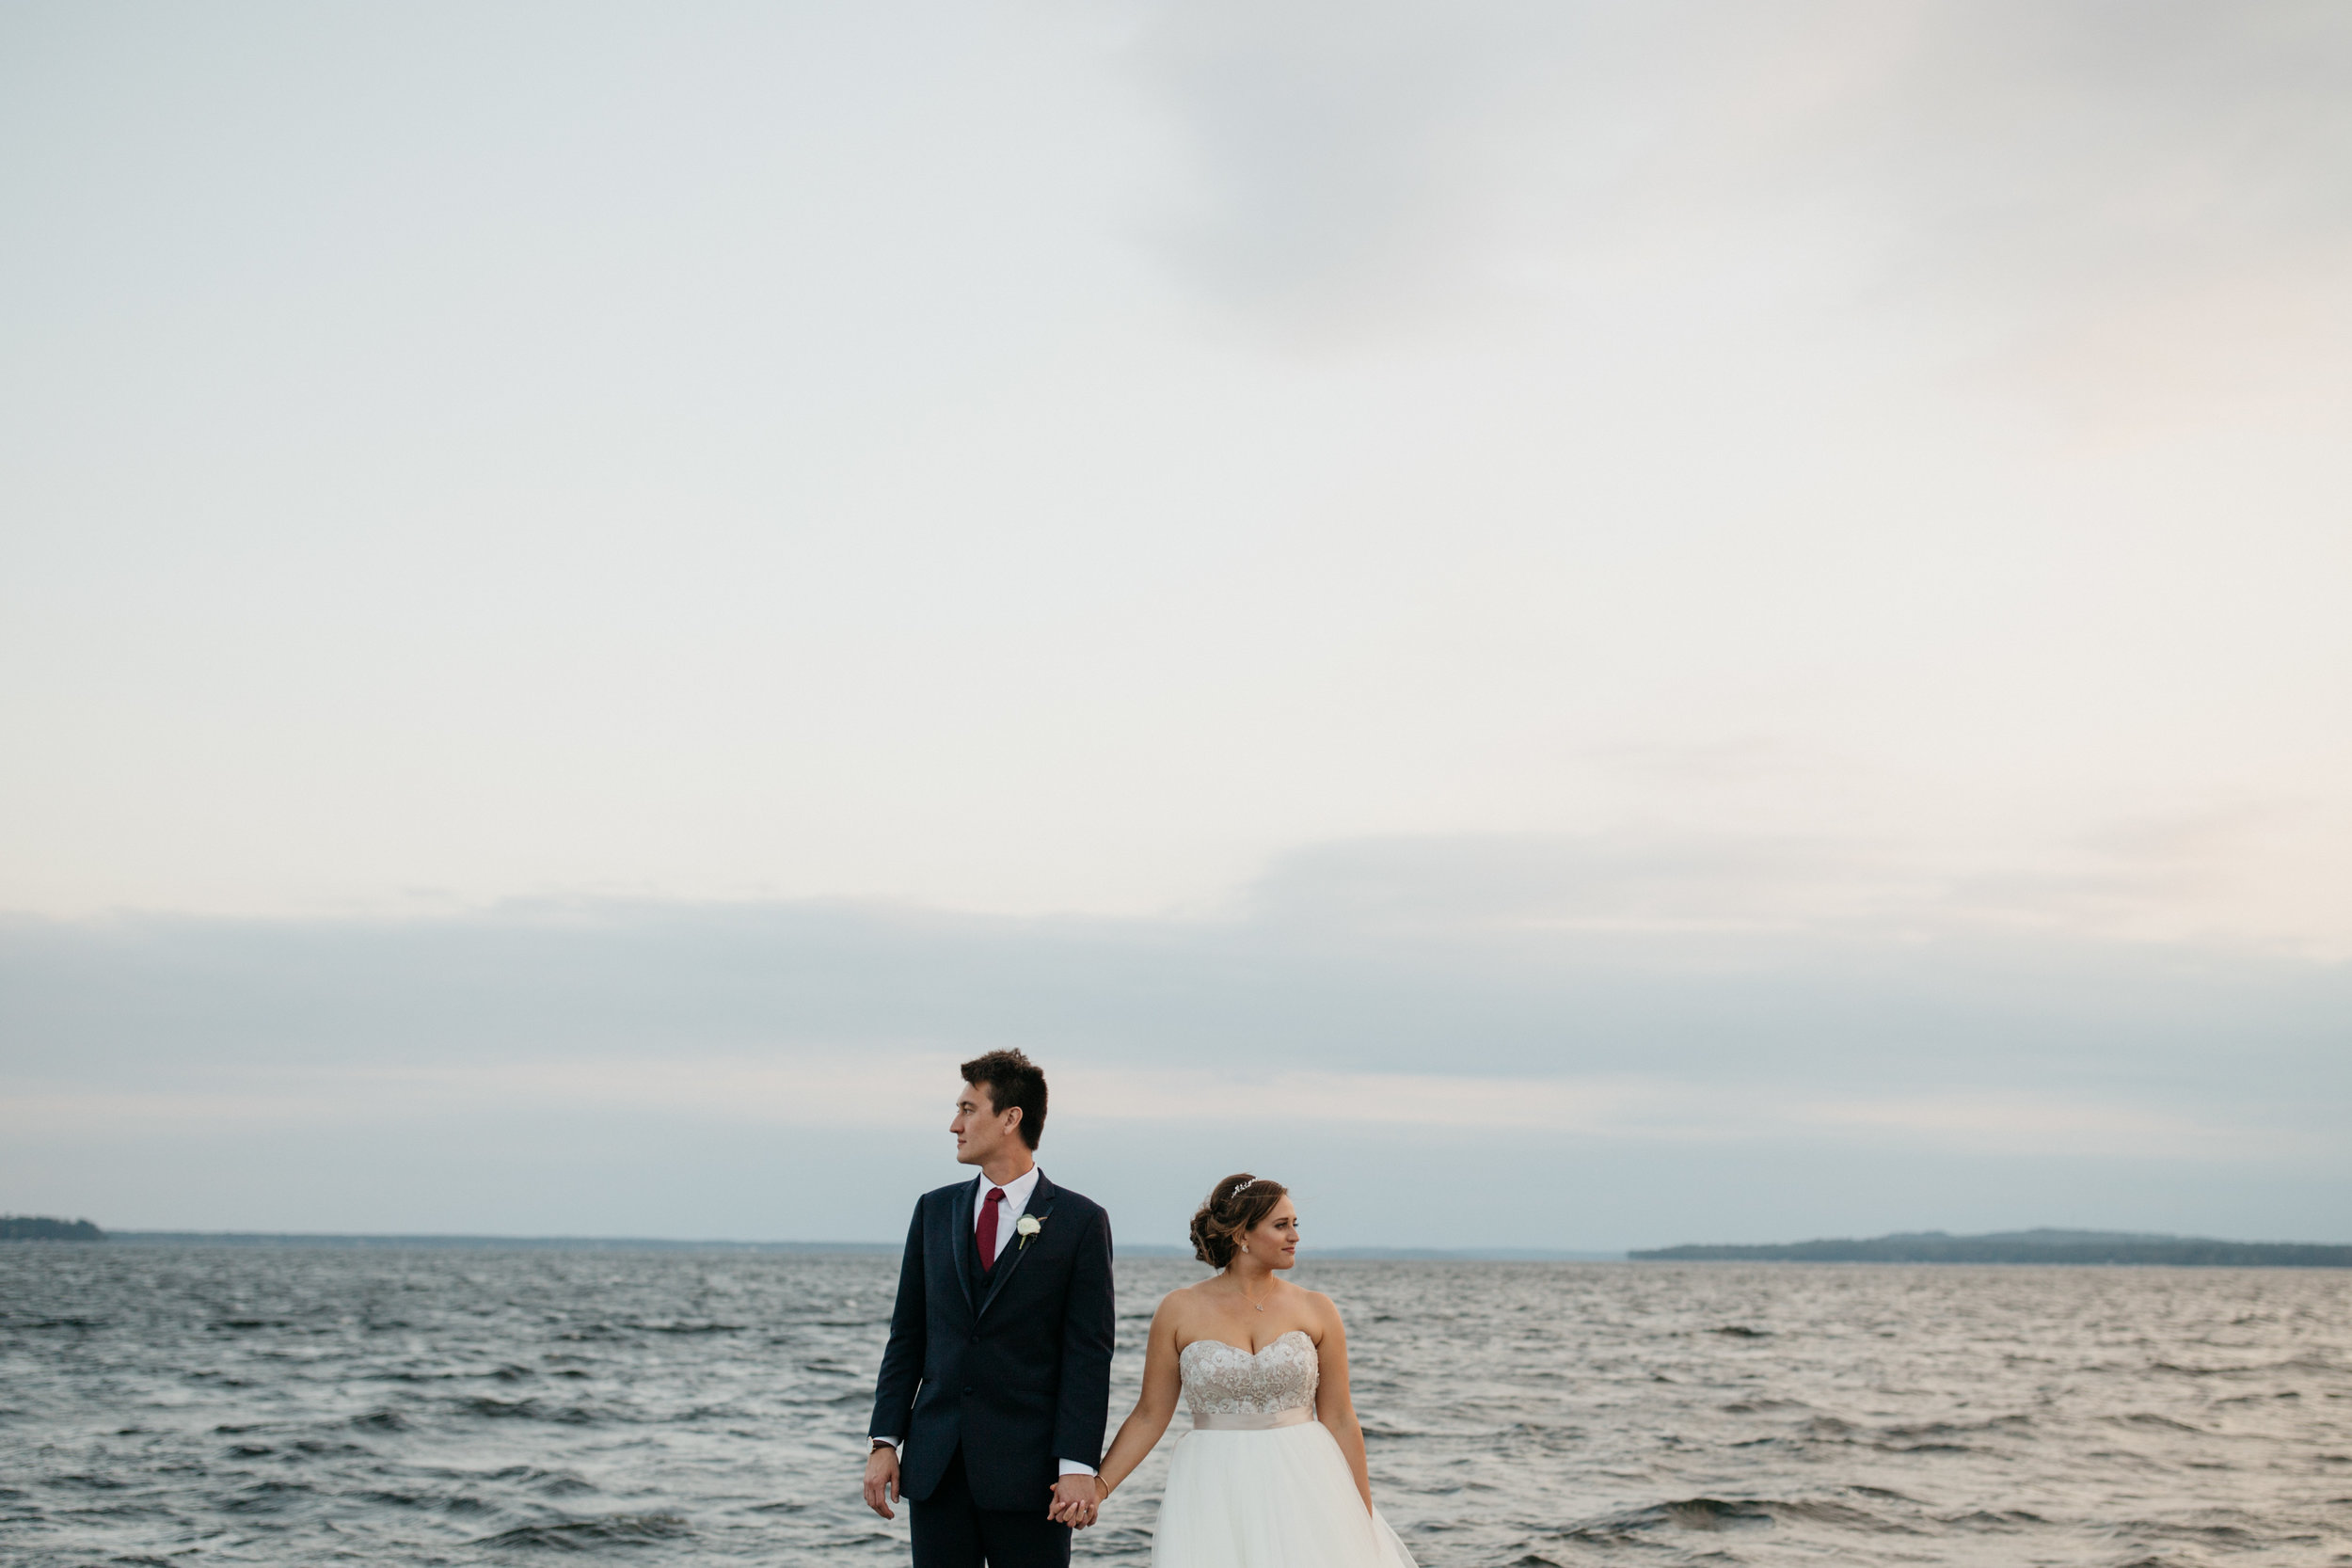 Grand View Lodge wedding. Photography by Britt DeZeeuw, modern photographer.